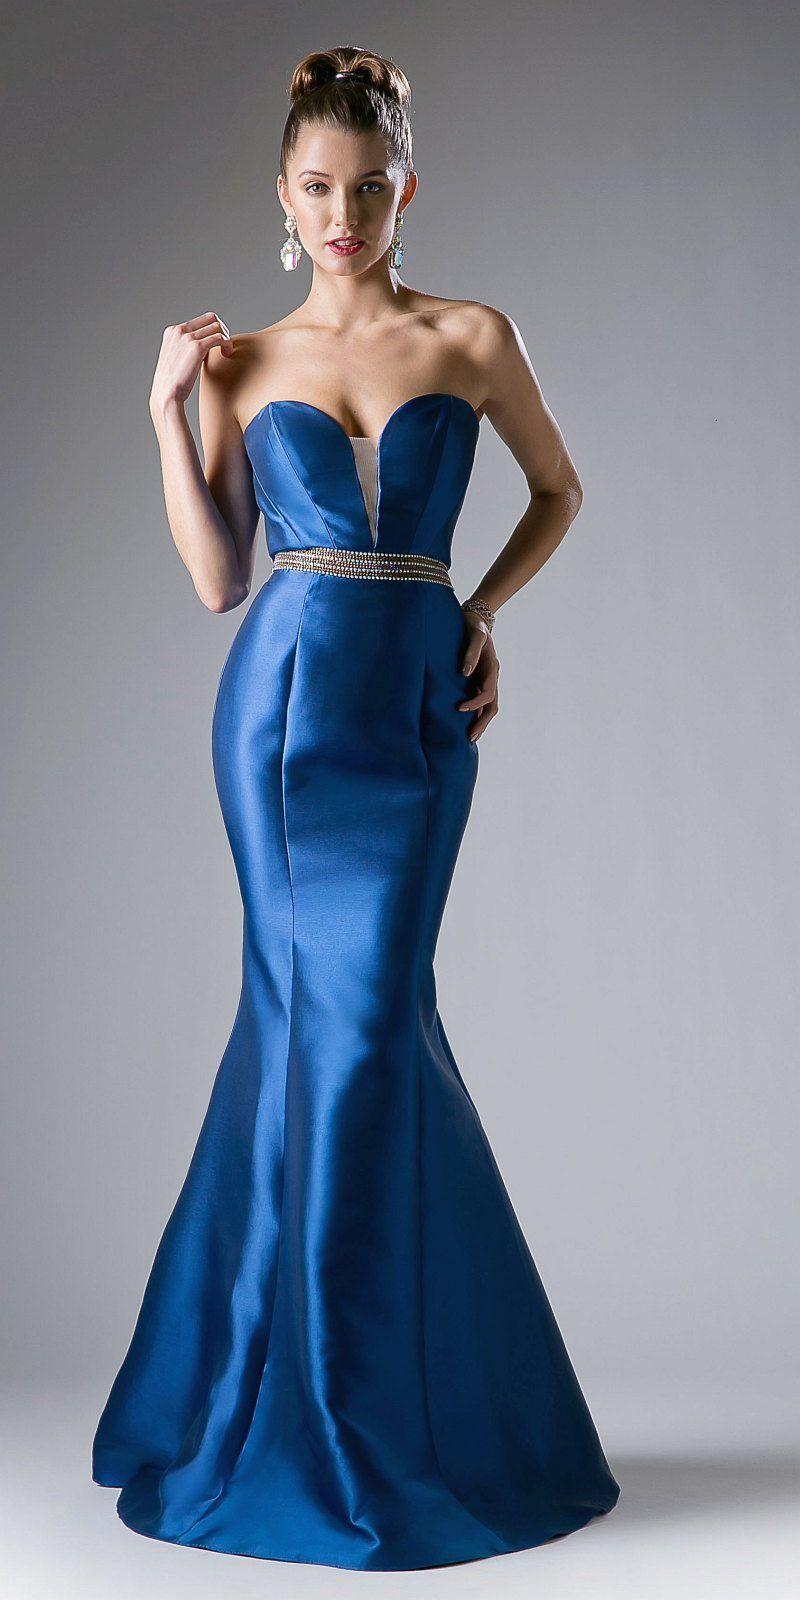 Strapless mermaid long prom dress cutout back fuchsia in